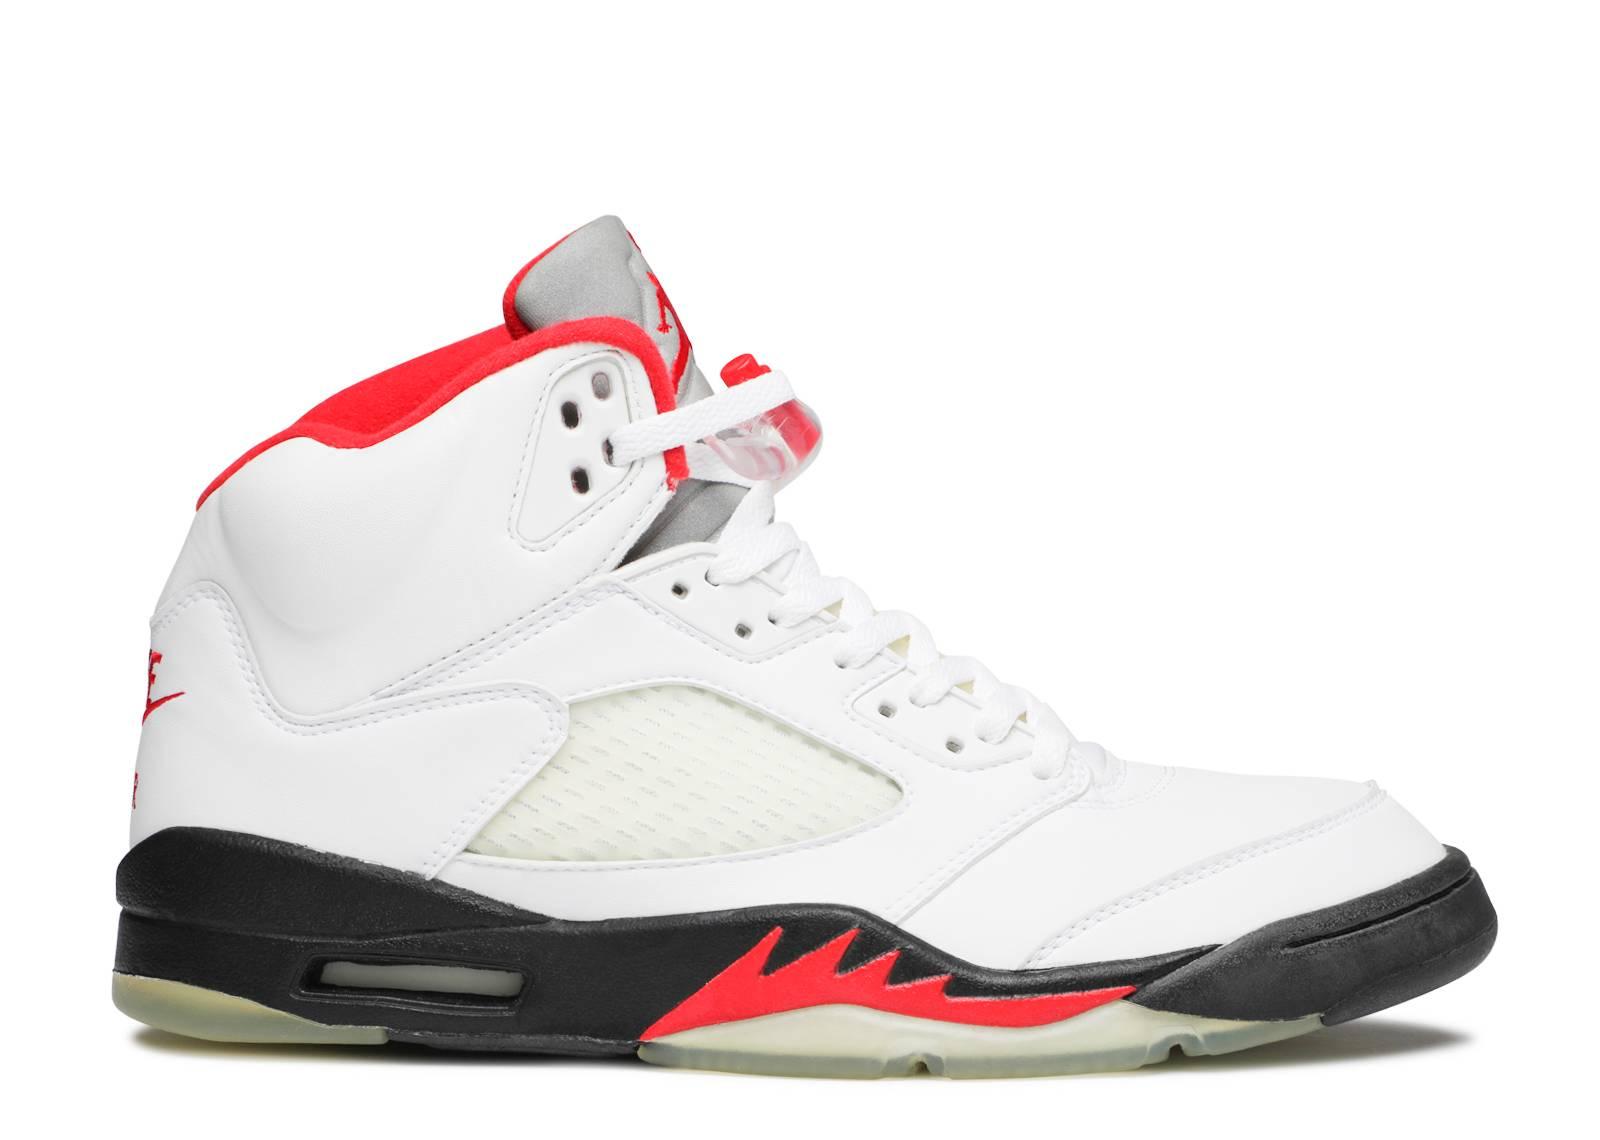 Air Jordan 5 Retro 'Fire Red' 2000